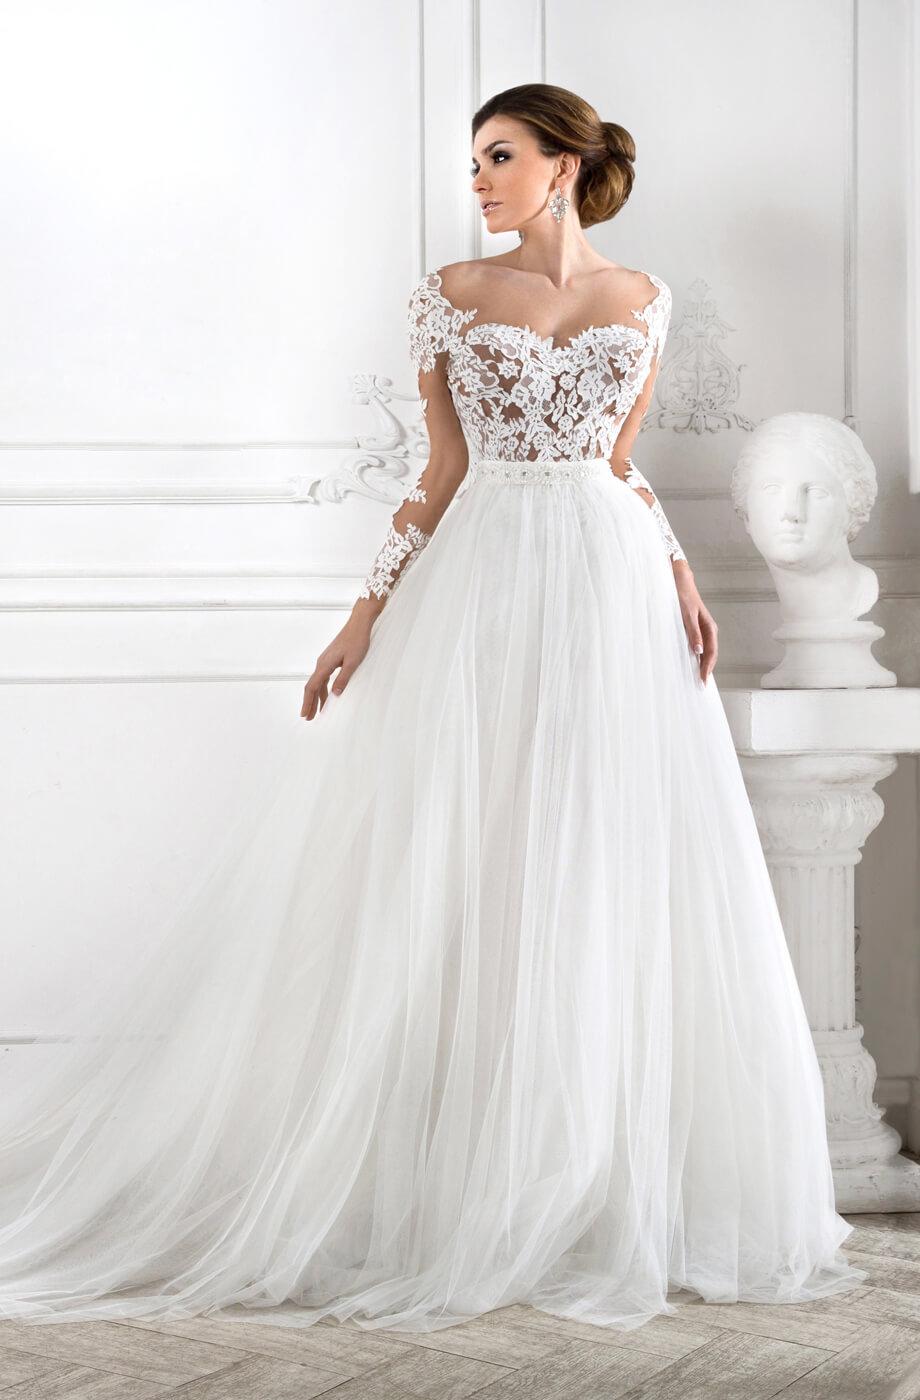 Chloe - Robe de mariée sur mesure